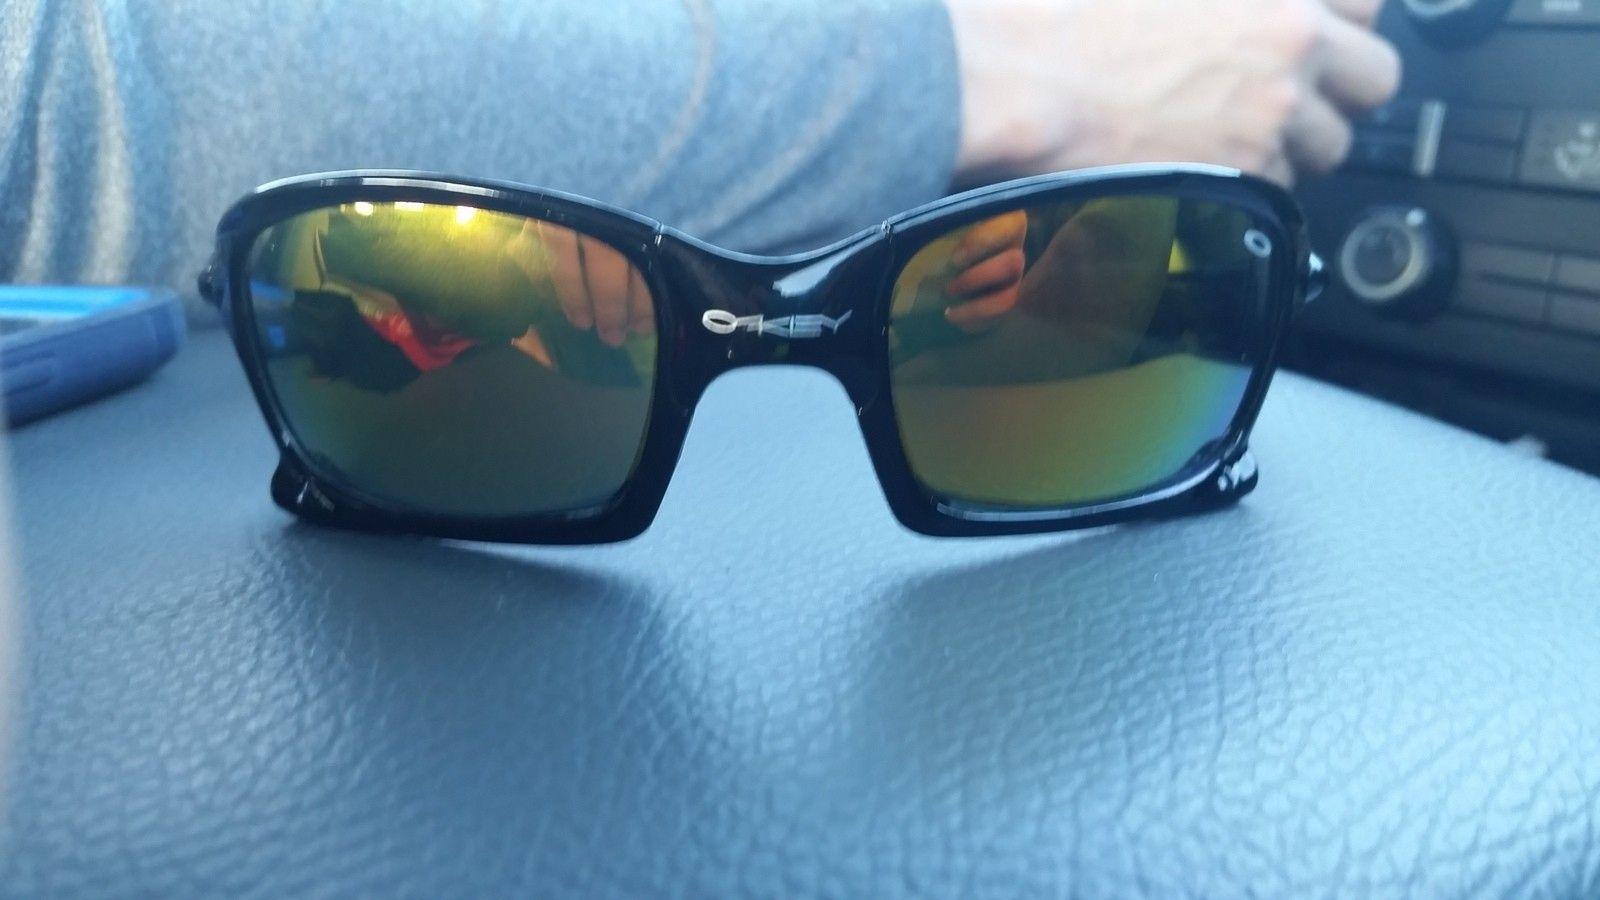 New Oakley's....fake? - 1425764996852.jpg